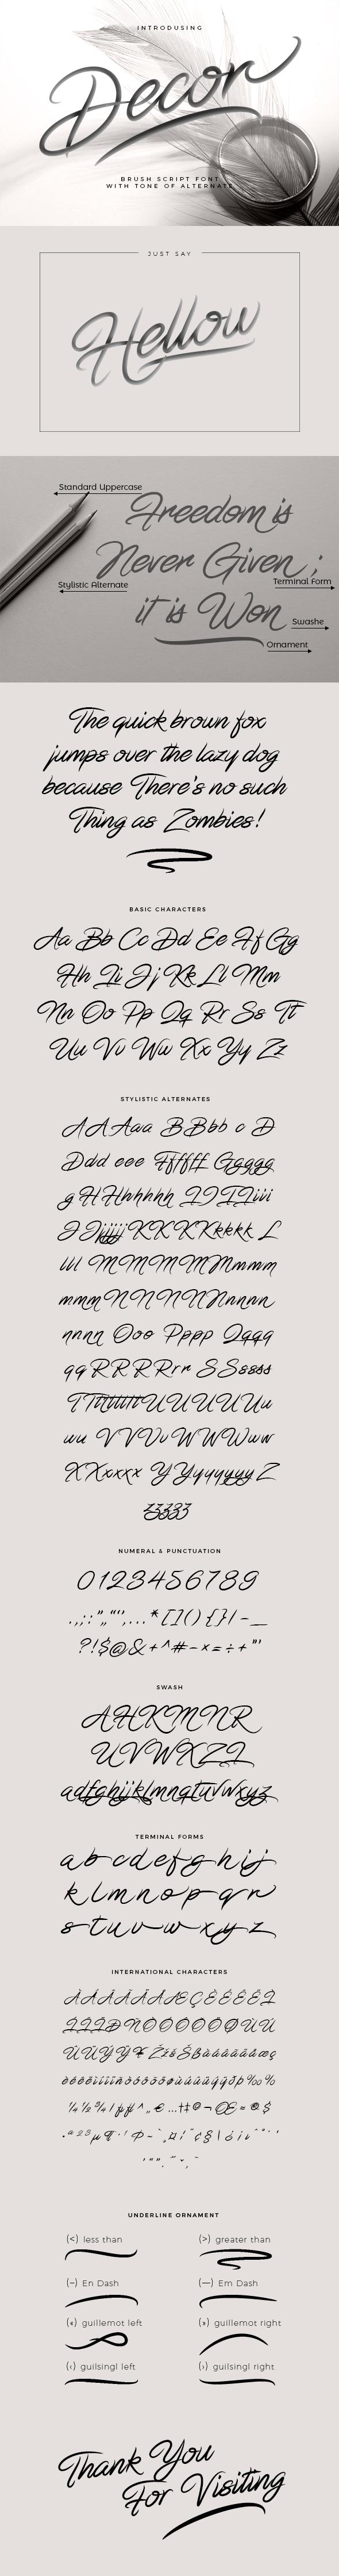 Decor Brush Script Font - Calligraphy Script